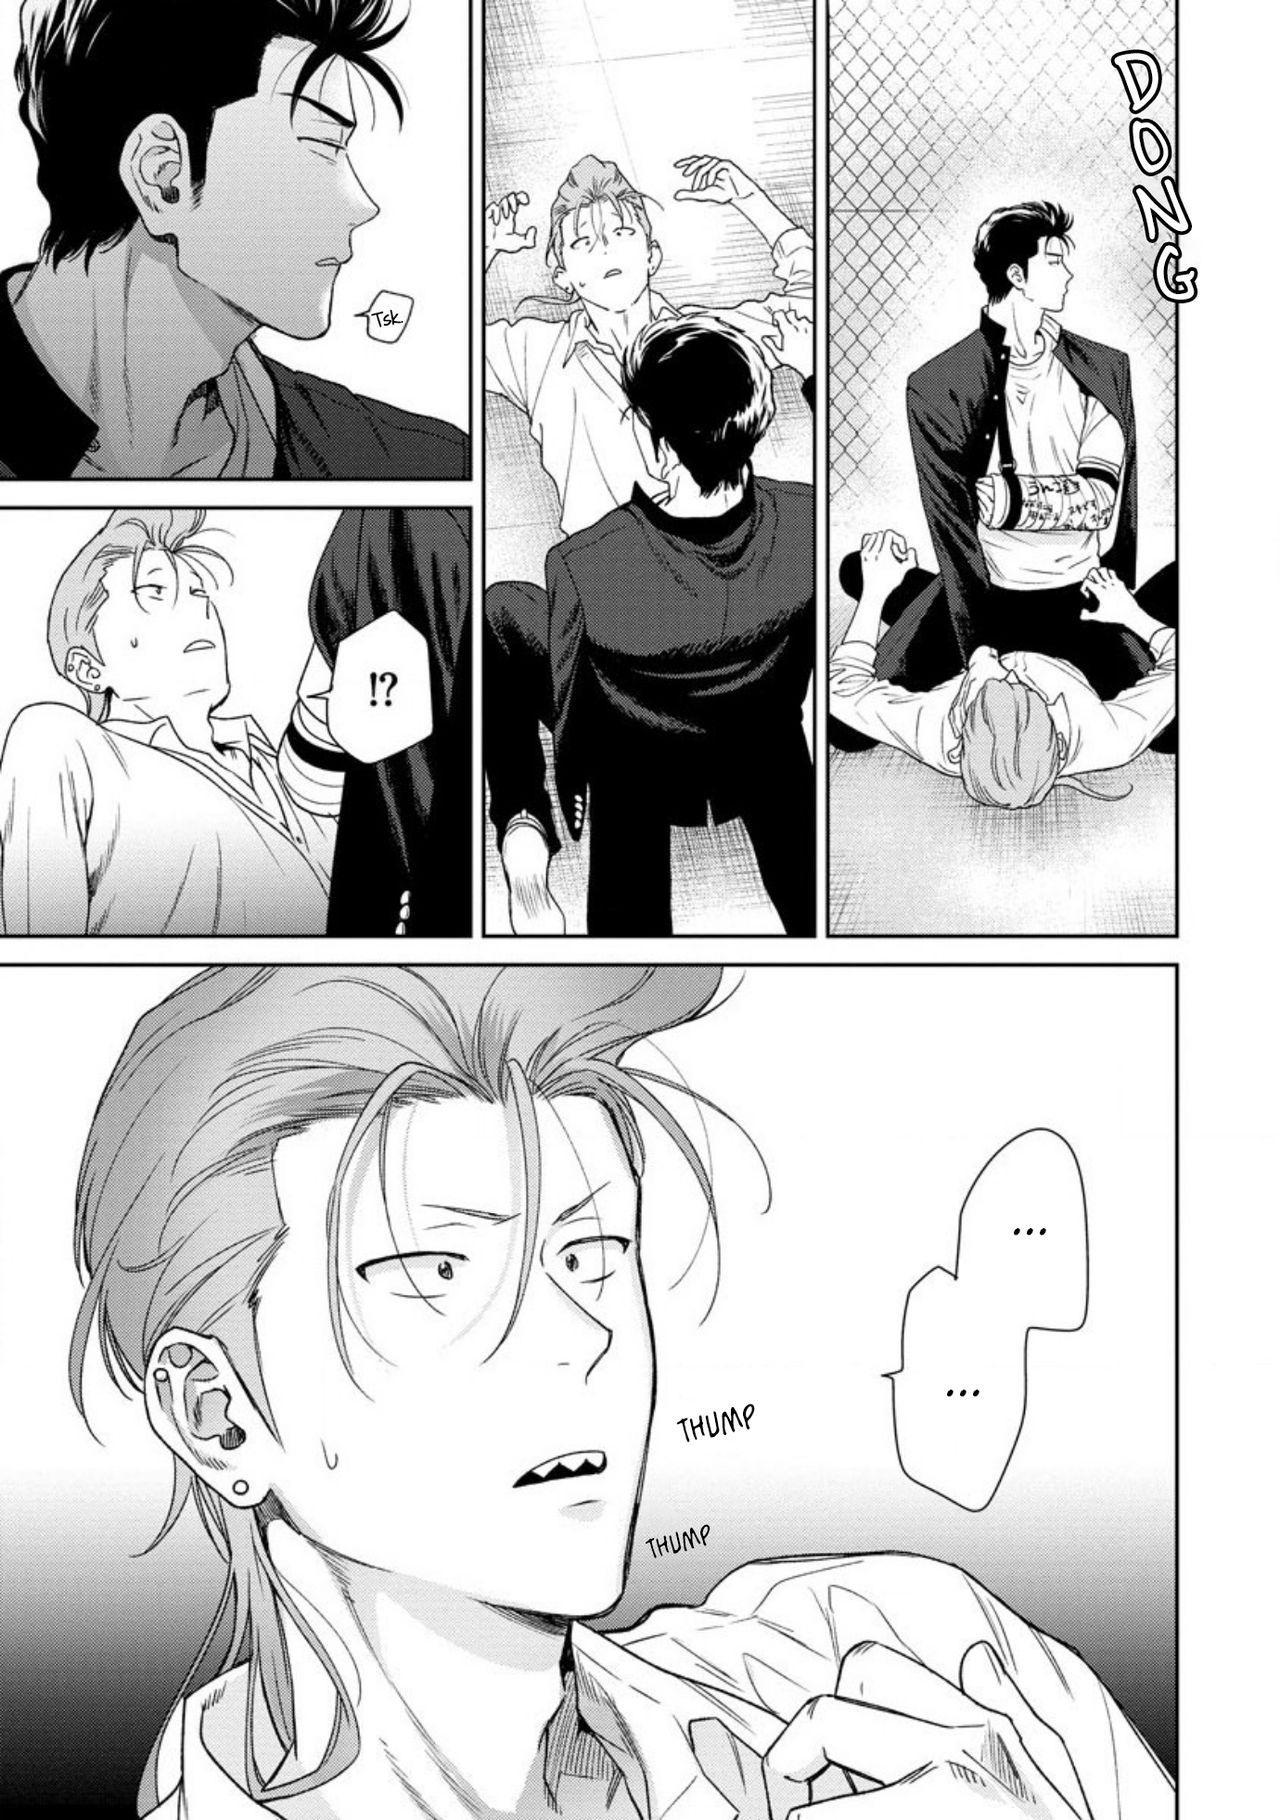 [Hiiragi Nozomu] Nakasete Yaru yo Yankee-kun   I'll Make You Cry Ch. 1-5 + Extras [English] [Digital] 134